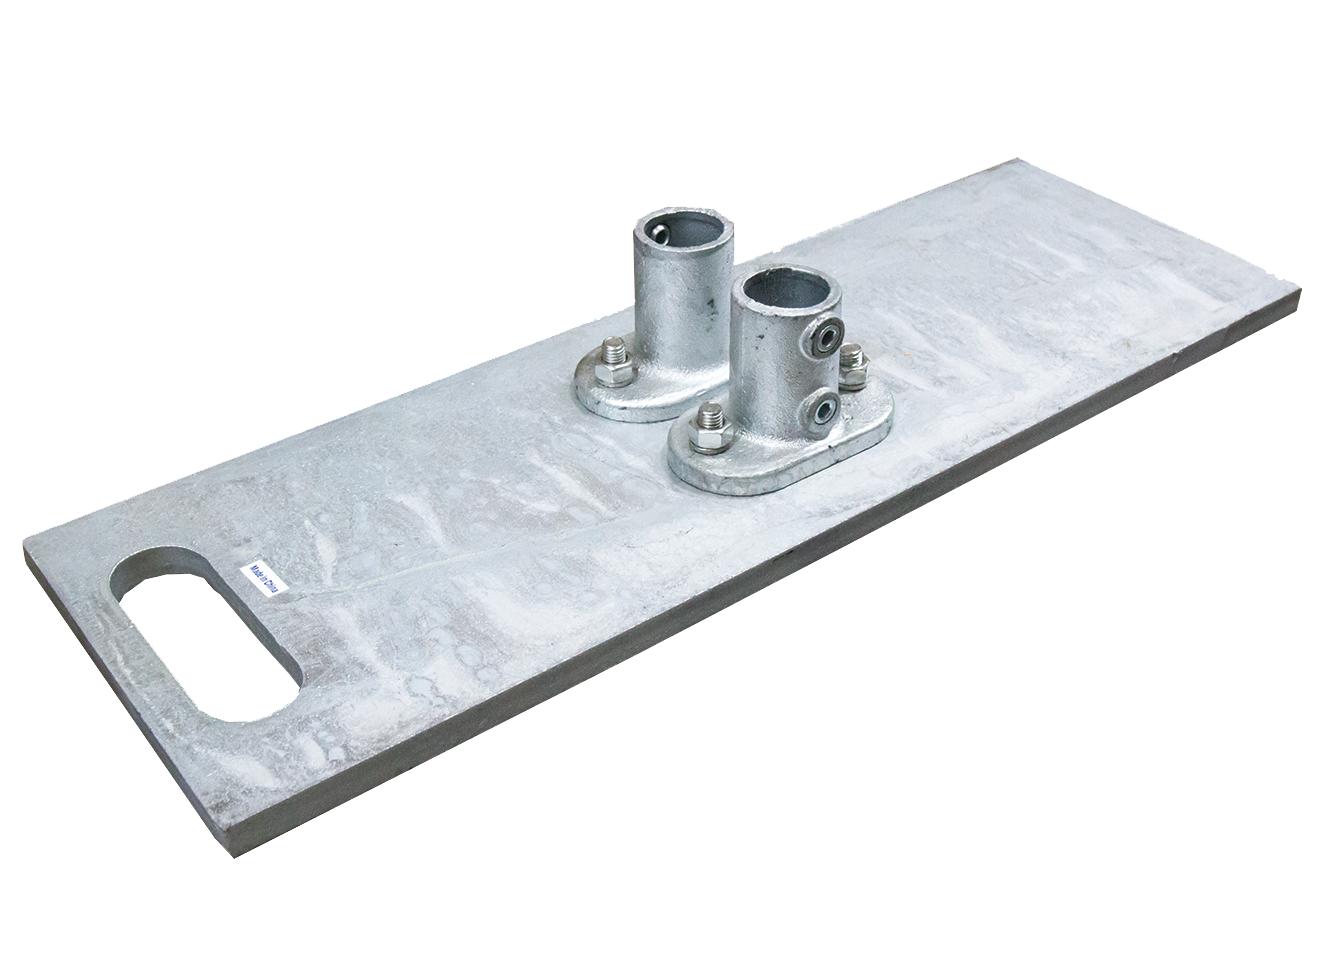 Guardian Baseplate (galvanized steel)